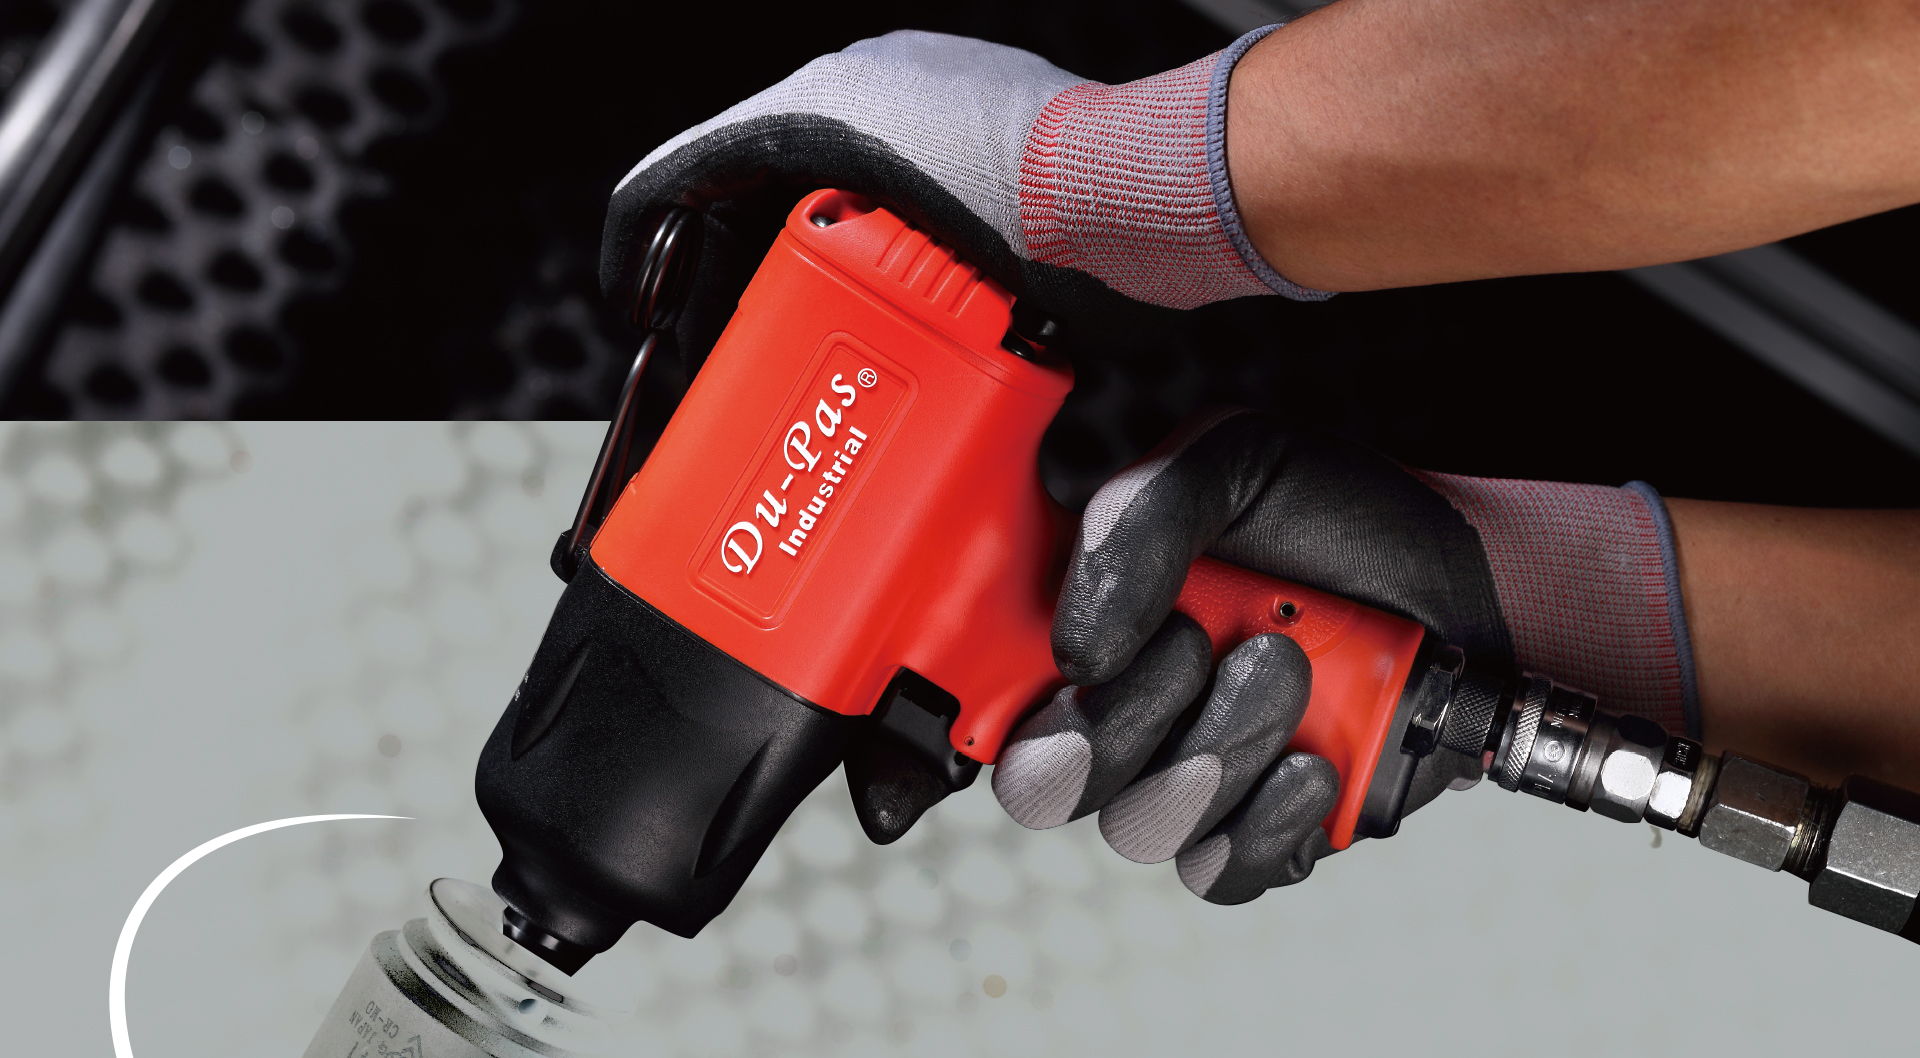 05-industrial-air-impact-tools